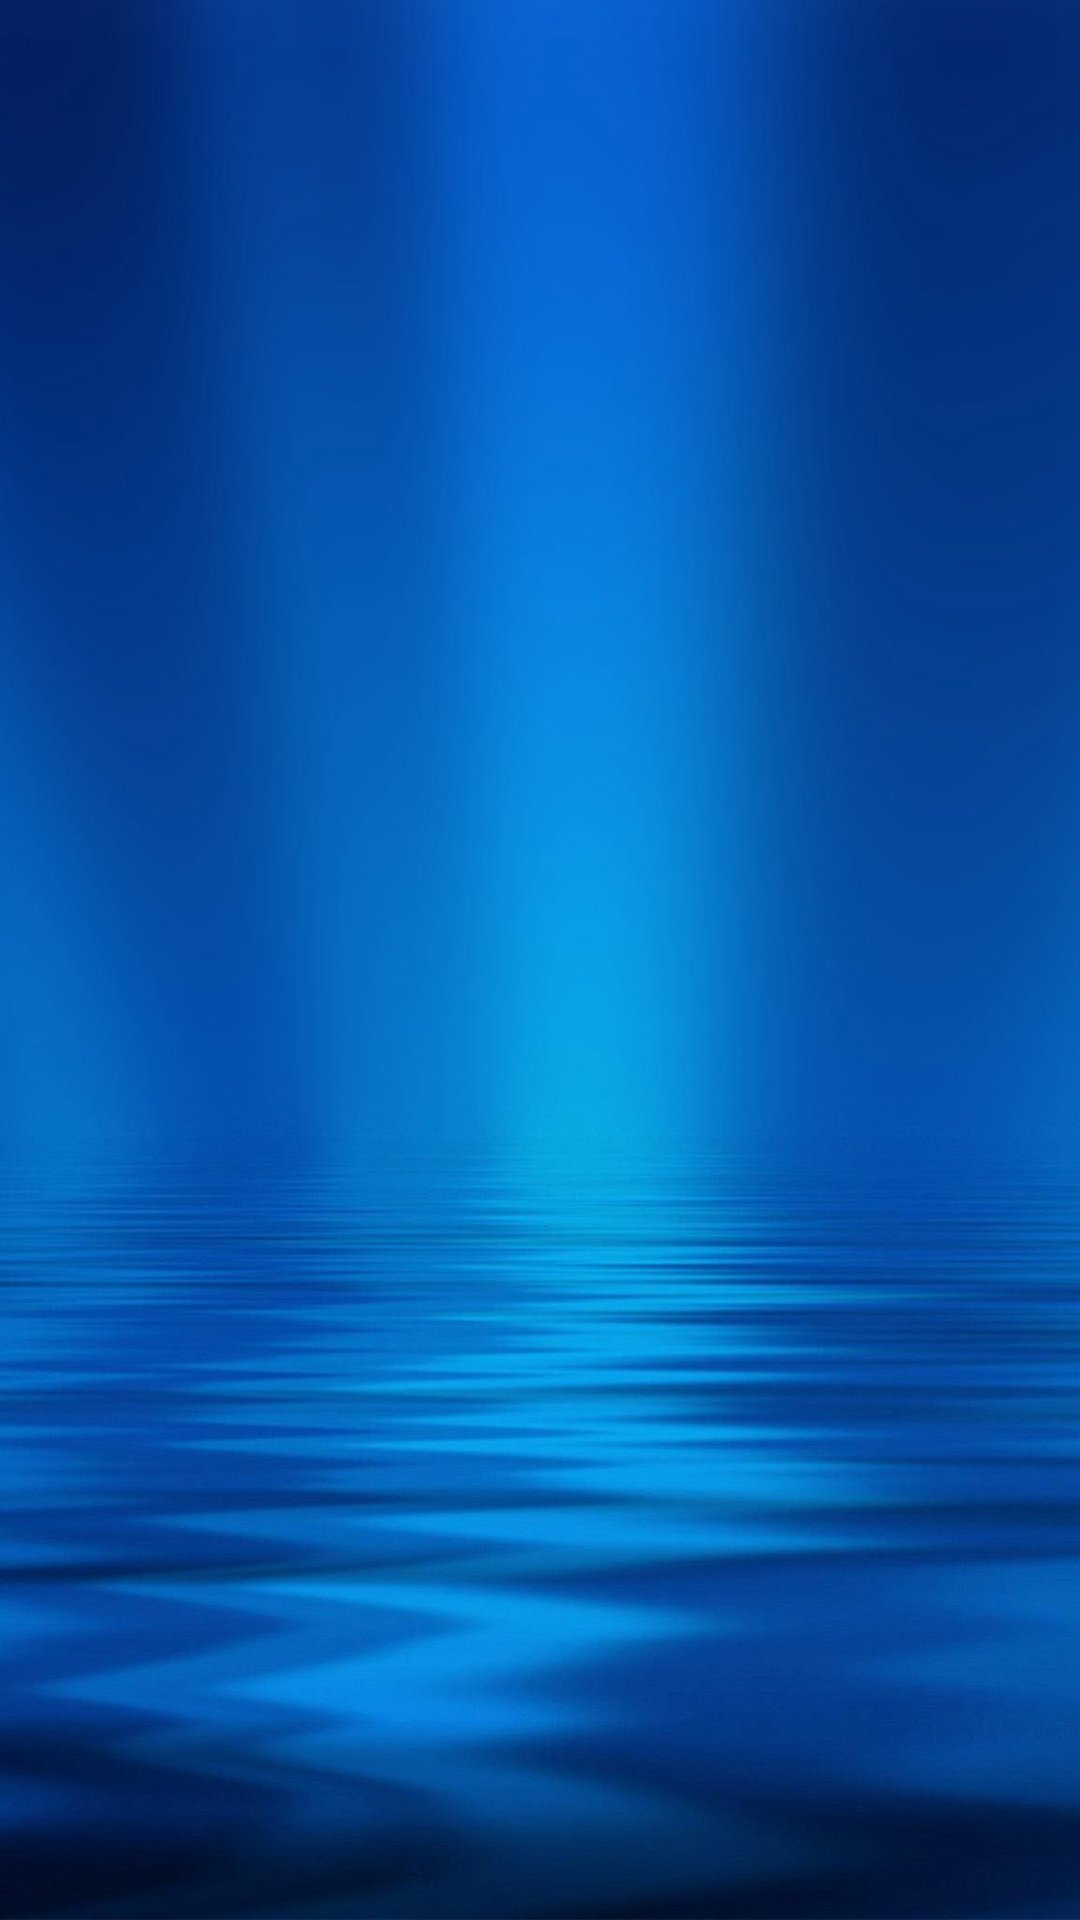 Sea Blue Ripple Pattern iPhone Wallpaper 1080x1920